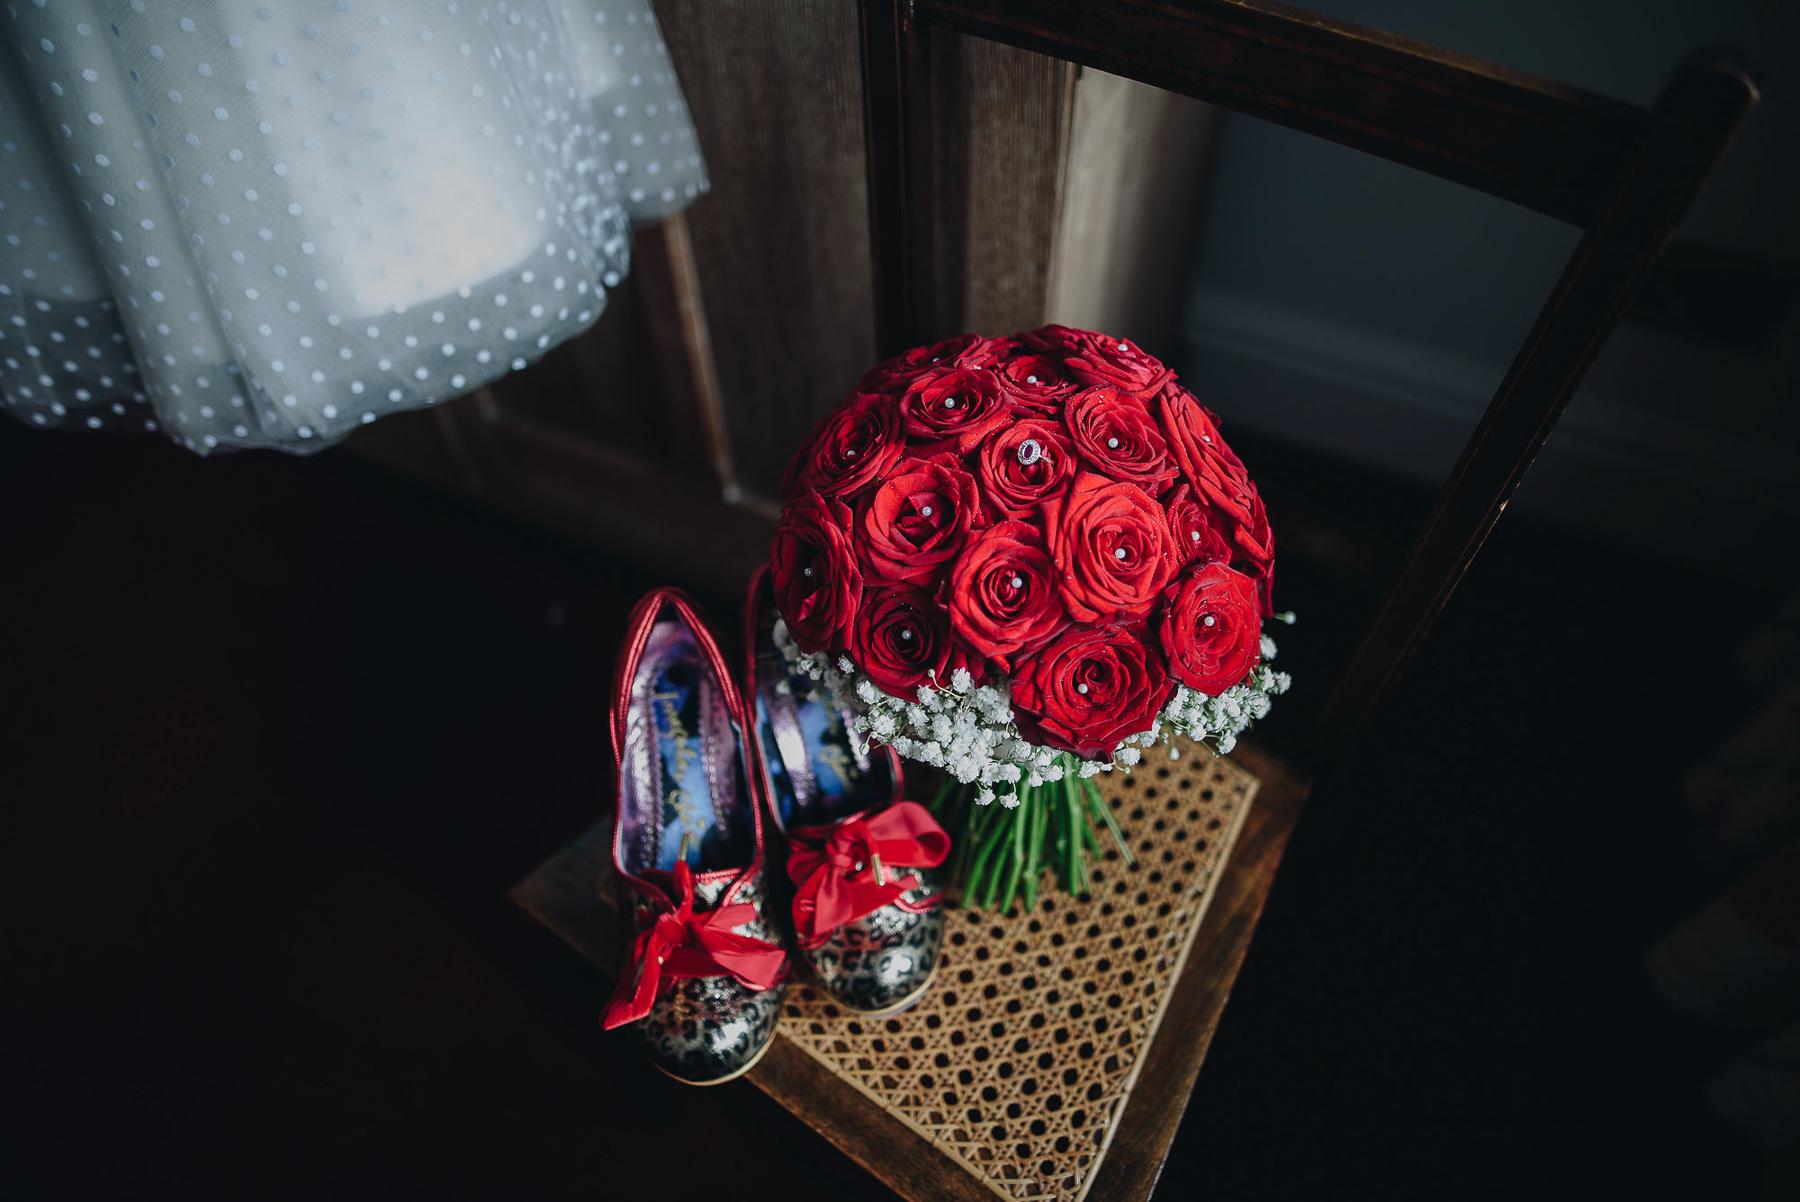 Wellbeing_Farm_Wedding_Photography_The_Pin-Up_Bride_Lara_Shaun-11.jpg